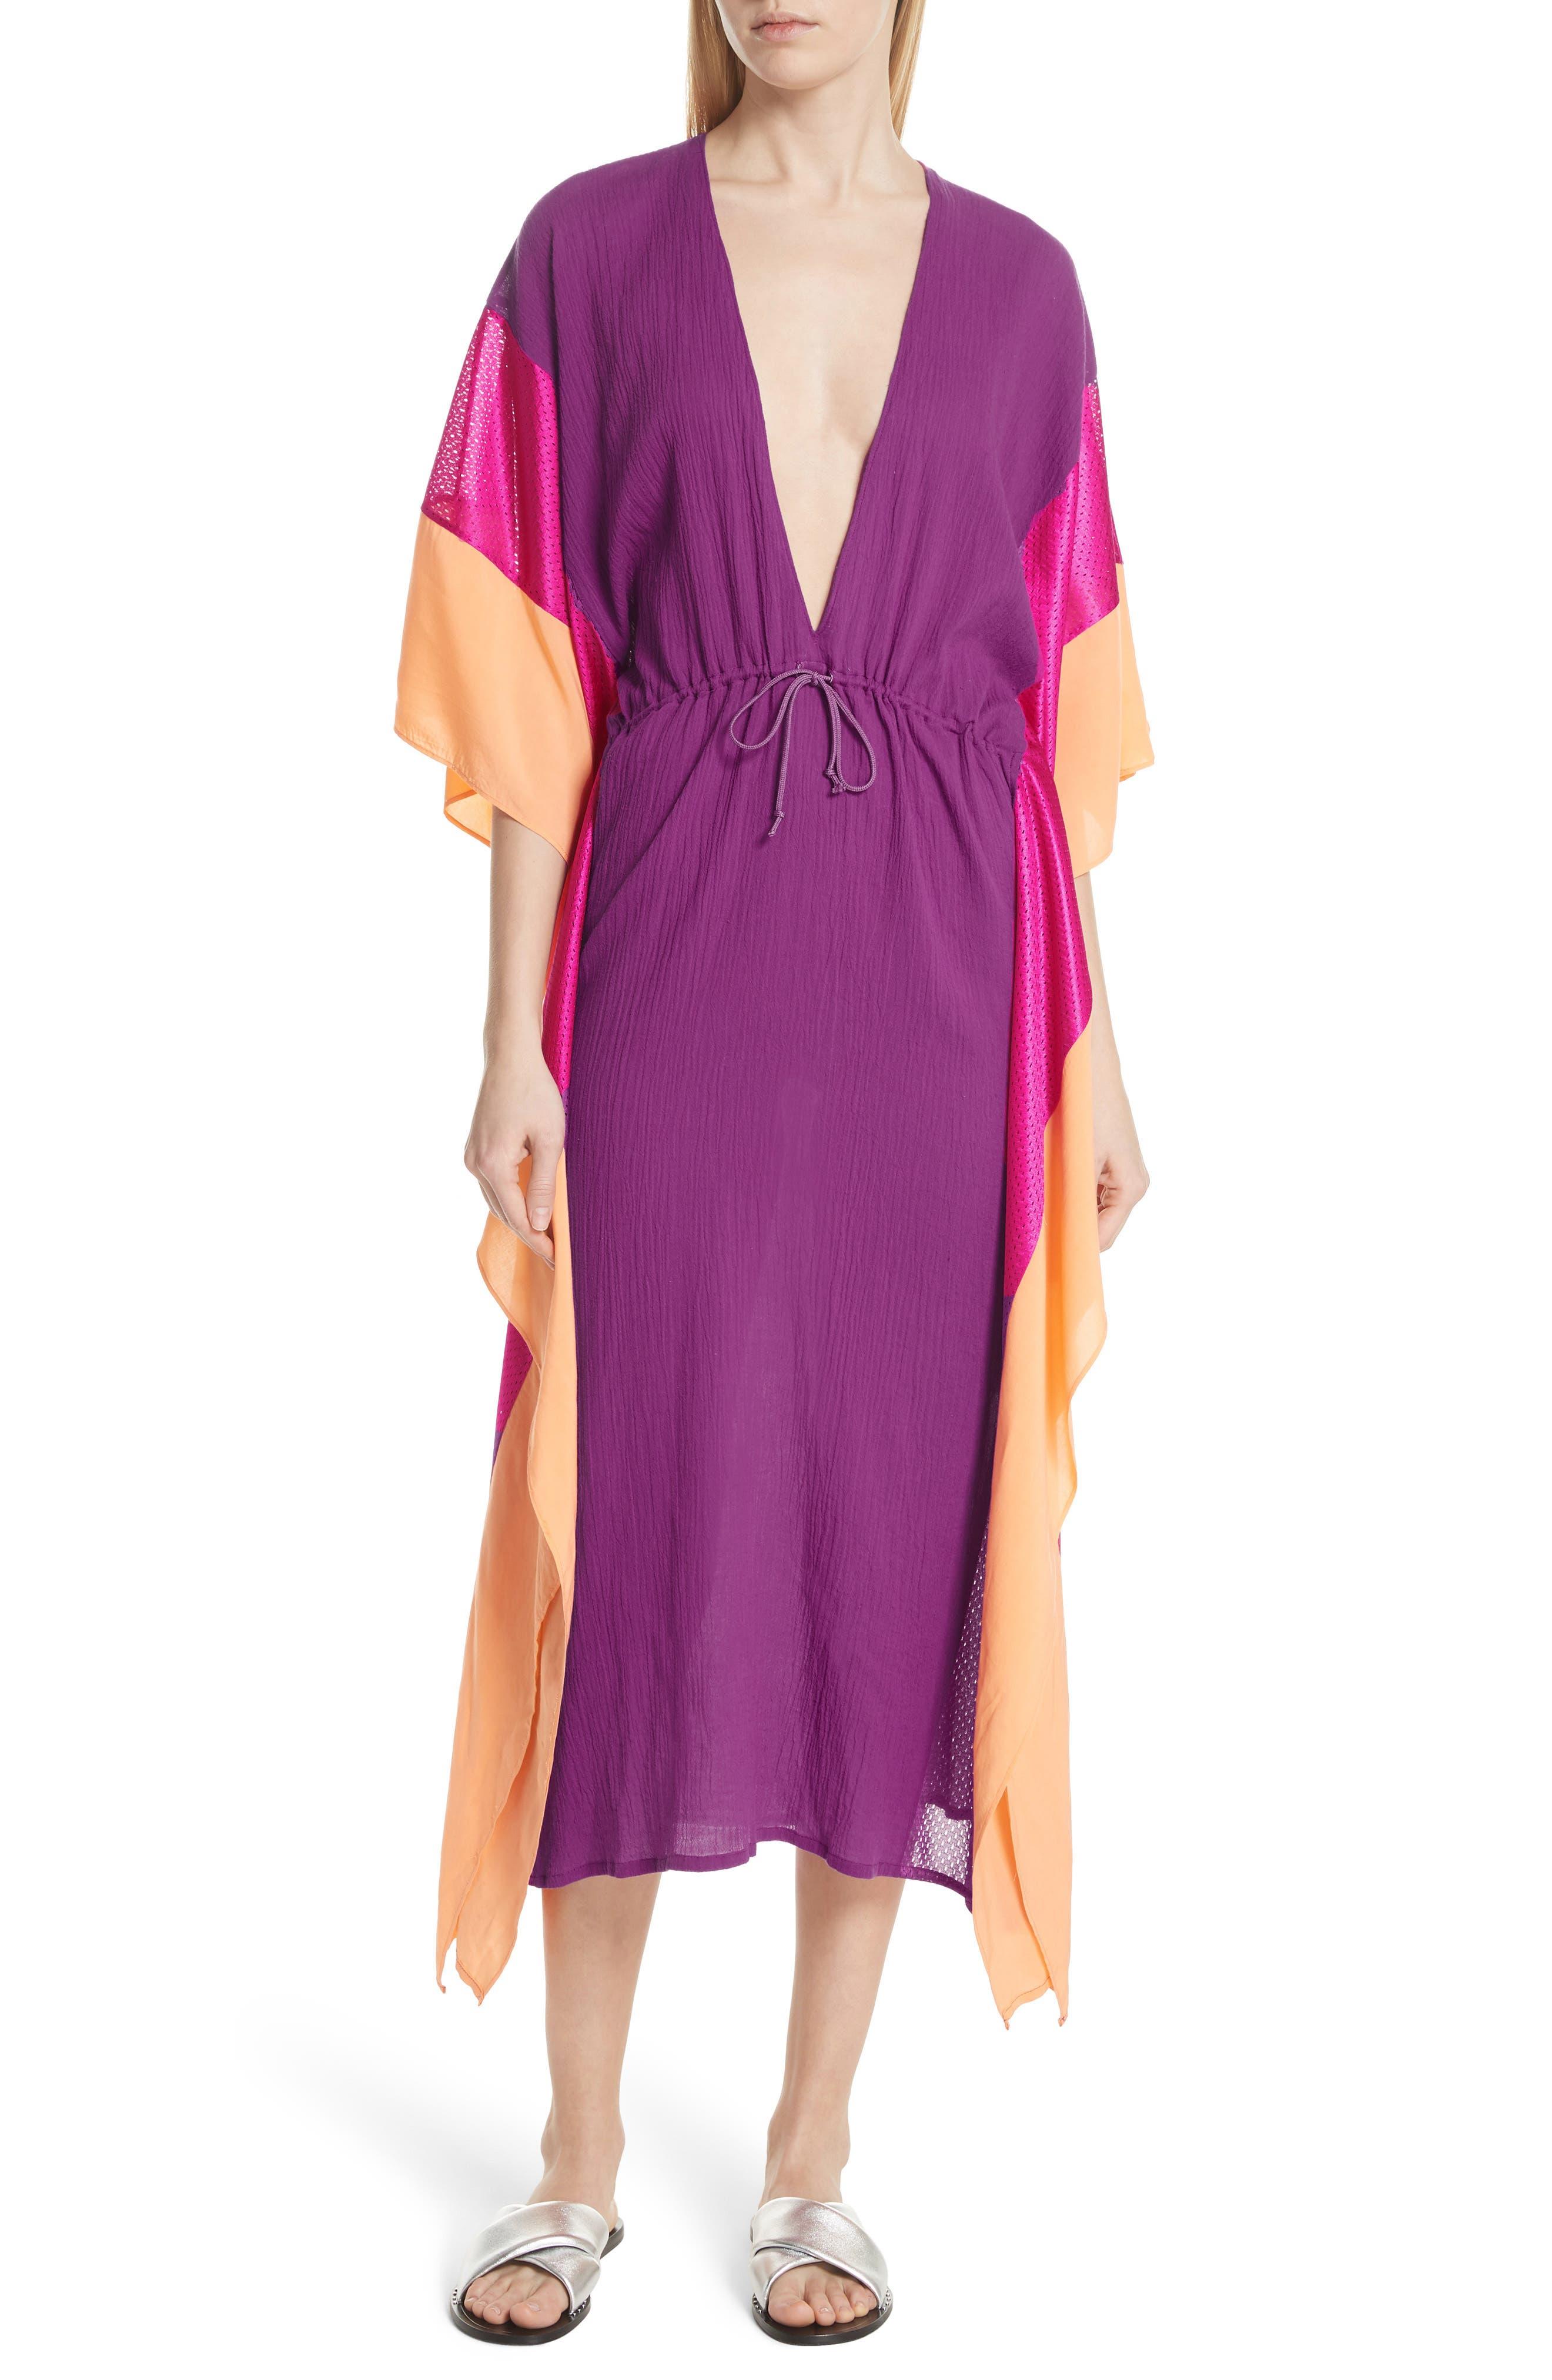 Sun Dance Caftan Dress,                             Main thumbnail 1, color,                             650